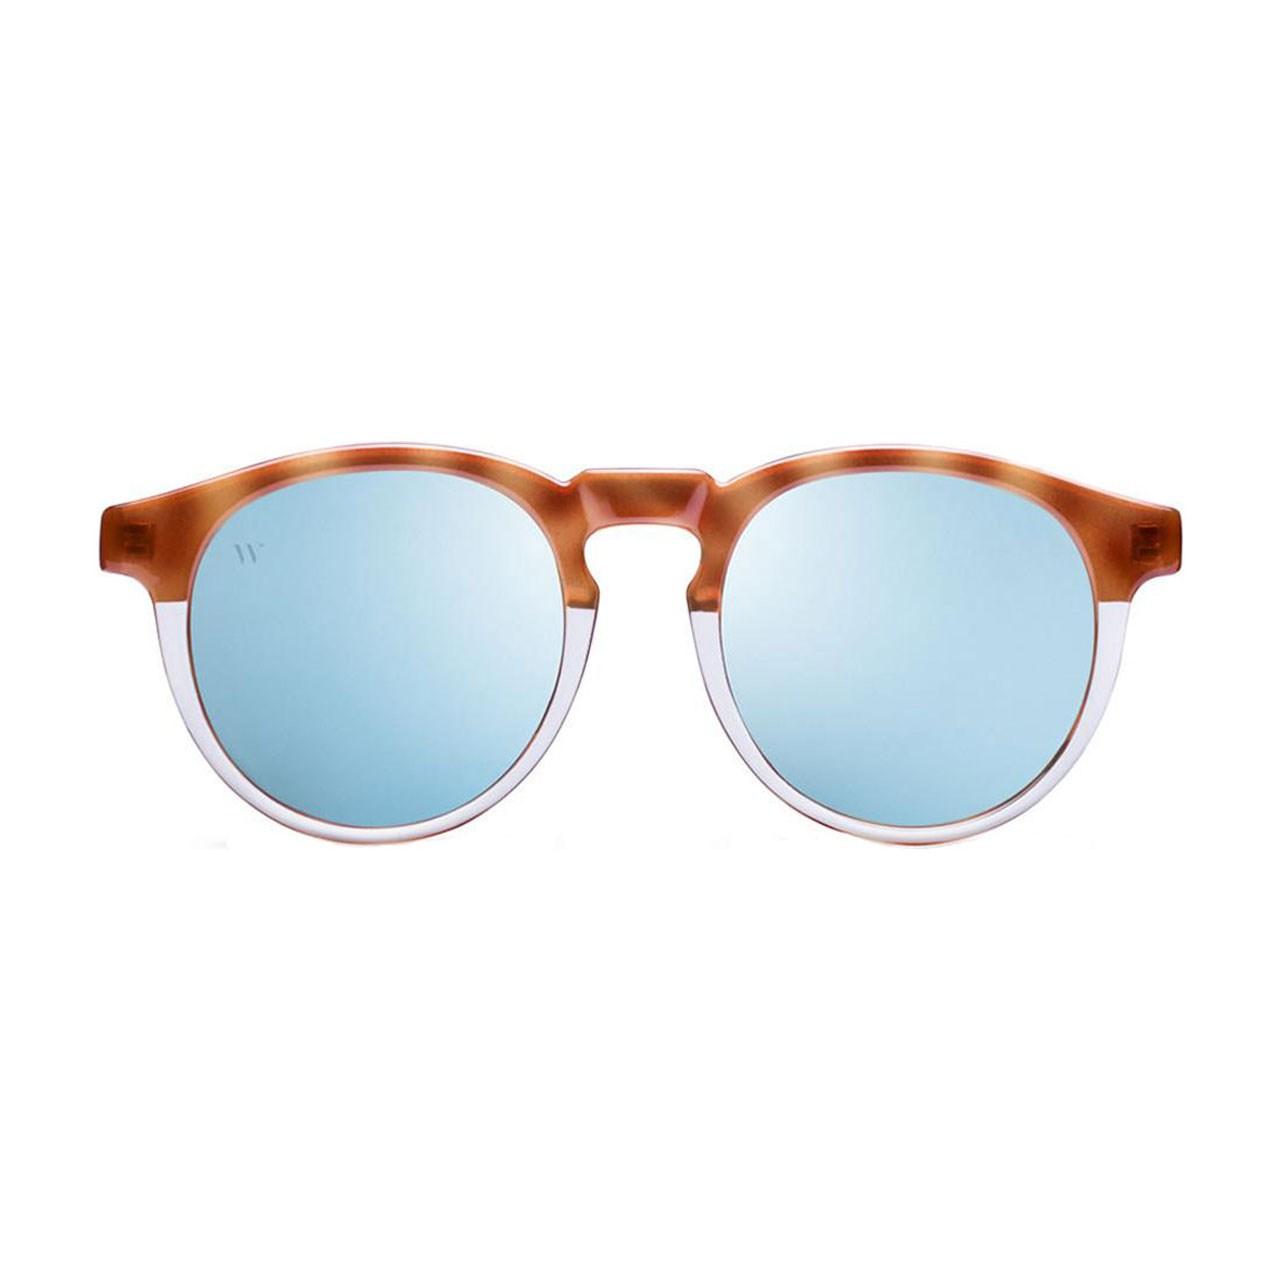 عینک آفتابی ولف نویر مدل Wolfnoir Hathi Bicome Sky